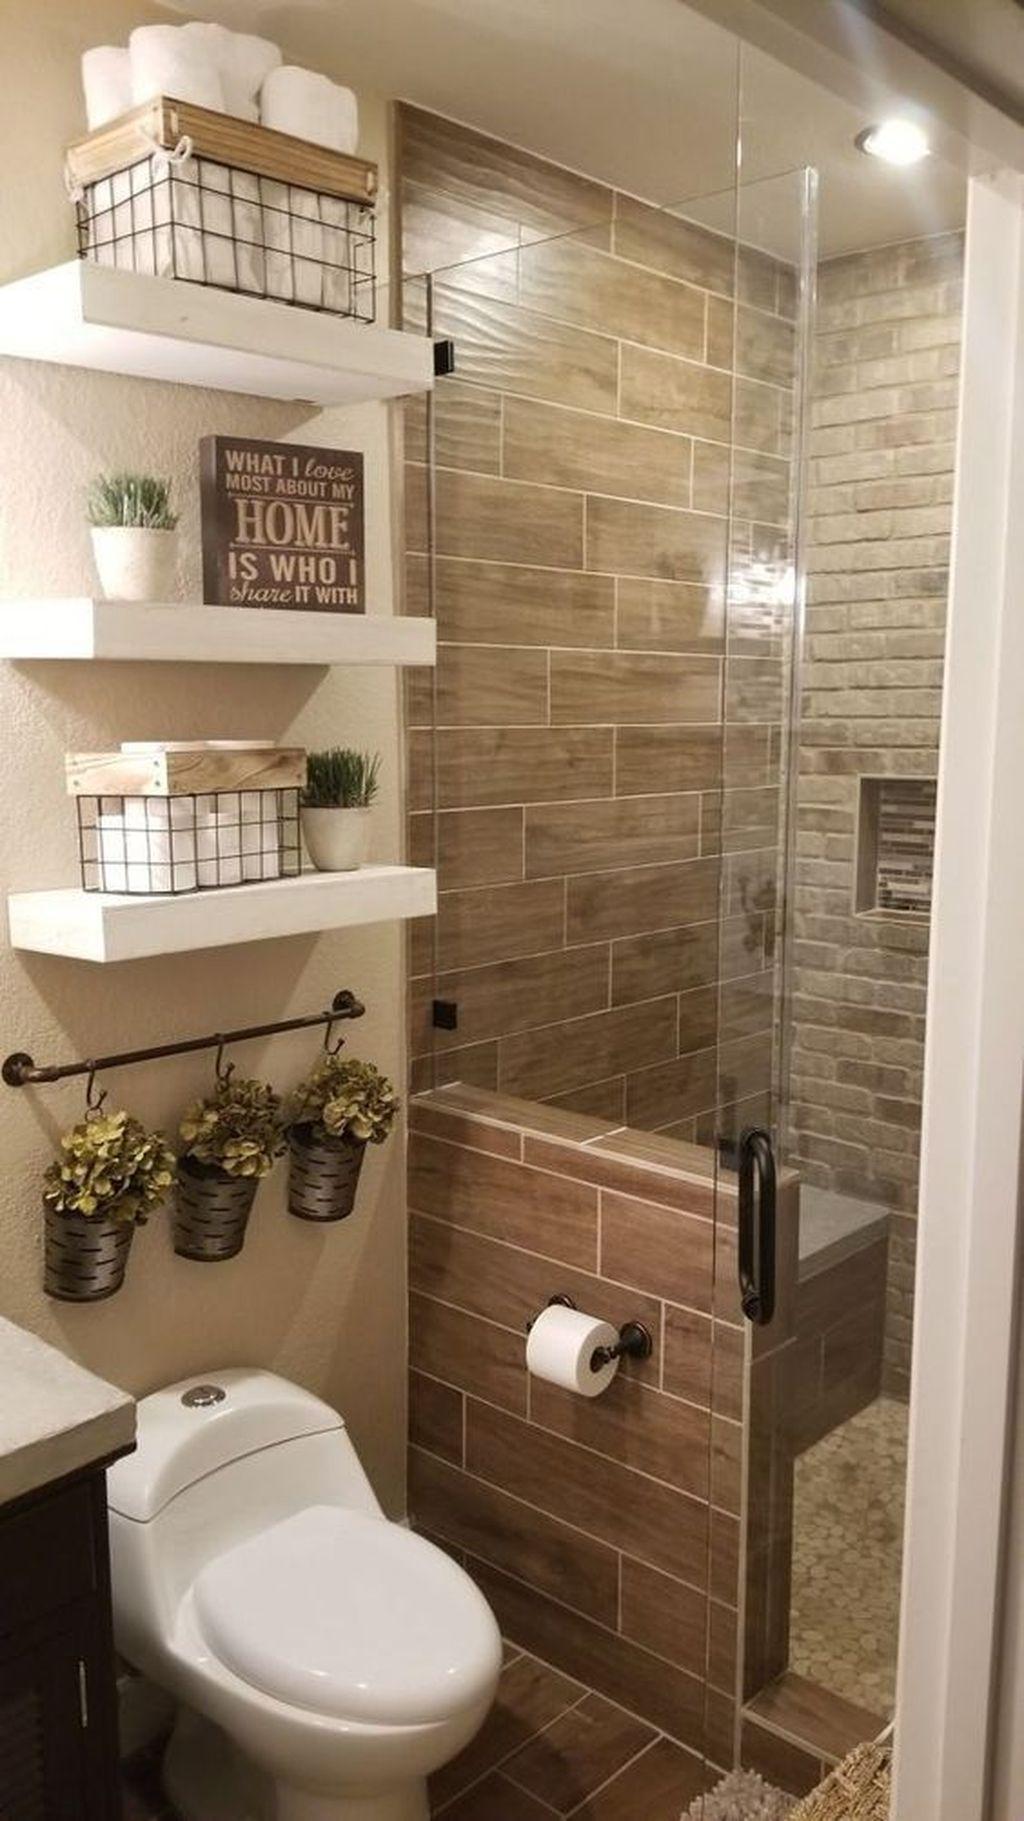 40 Brilliant Bathroom Decor Ideas On A Budget In 2020 Bathroom Decor Apartment Master Bathroom Makeover Bathroom Design Small